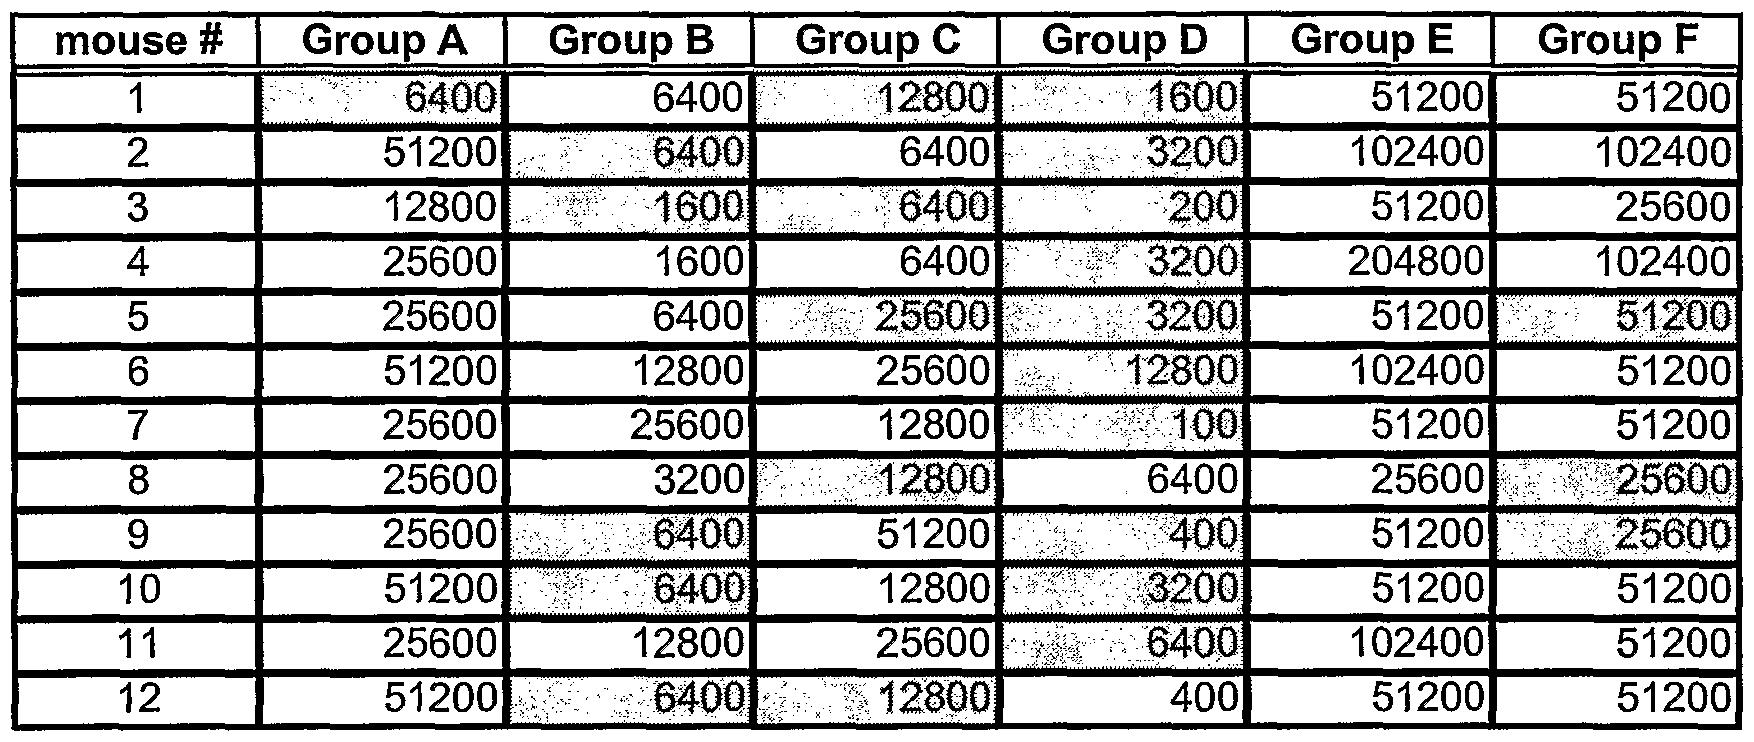 Gcu Academic Calendar 2021 20   Printable Calendar 2020 2021 Throughout Academic Calendar 2021 20 Chamberlain